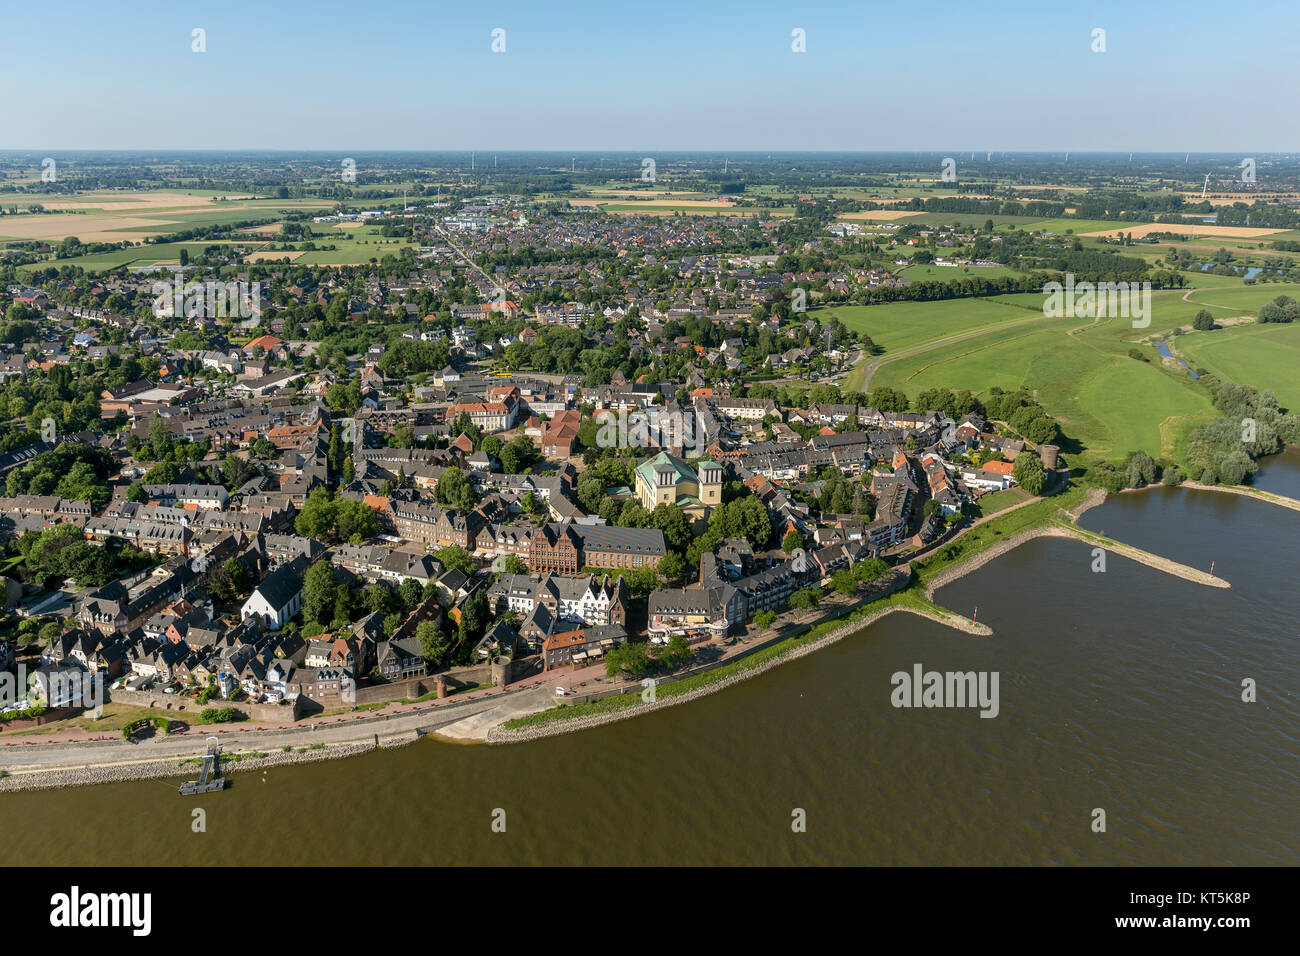 Rees city view from the Rhine, Rhine quay, Kalkar, Lower Rhine, North Rhine-Westphalia, Germany, Europe, Kalkar, - Stock Image